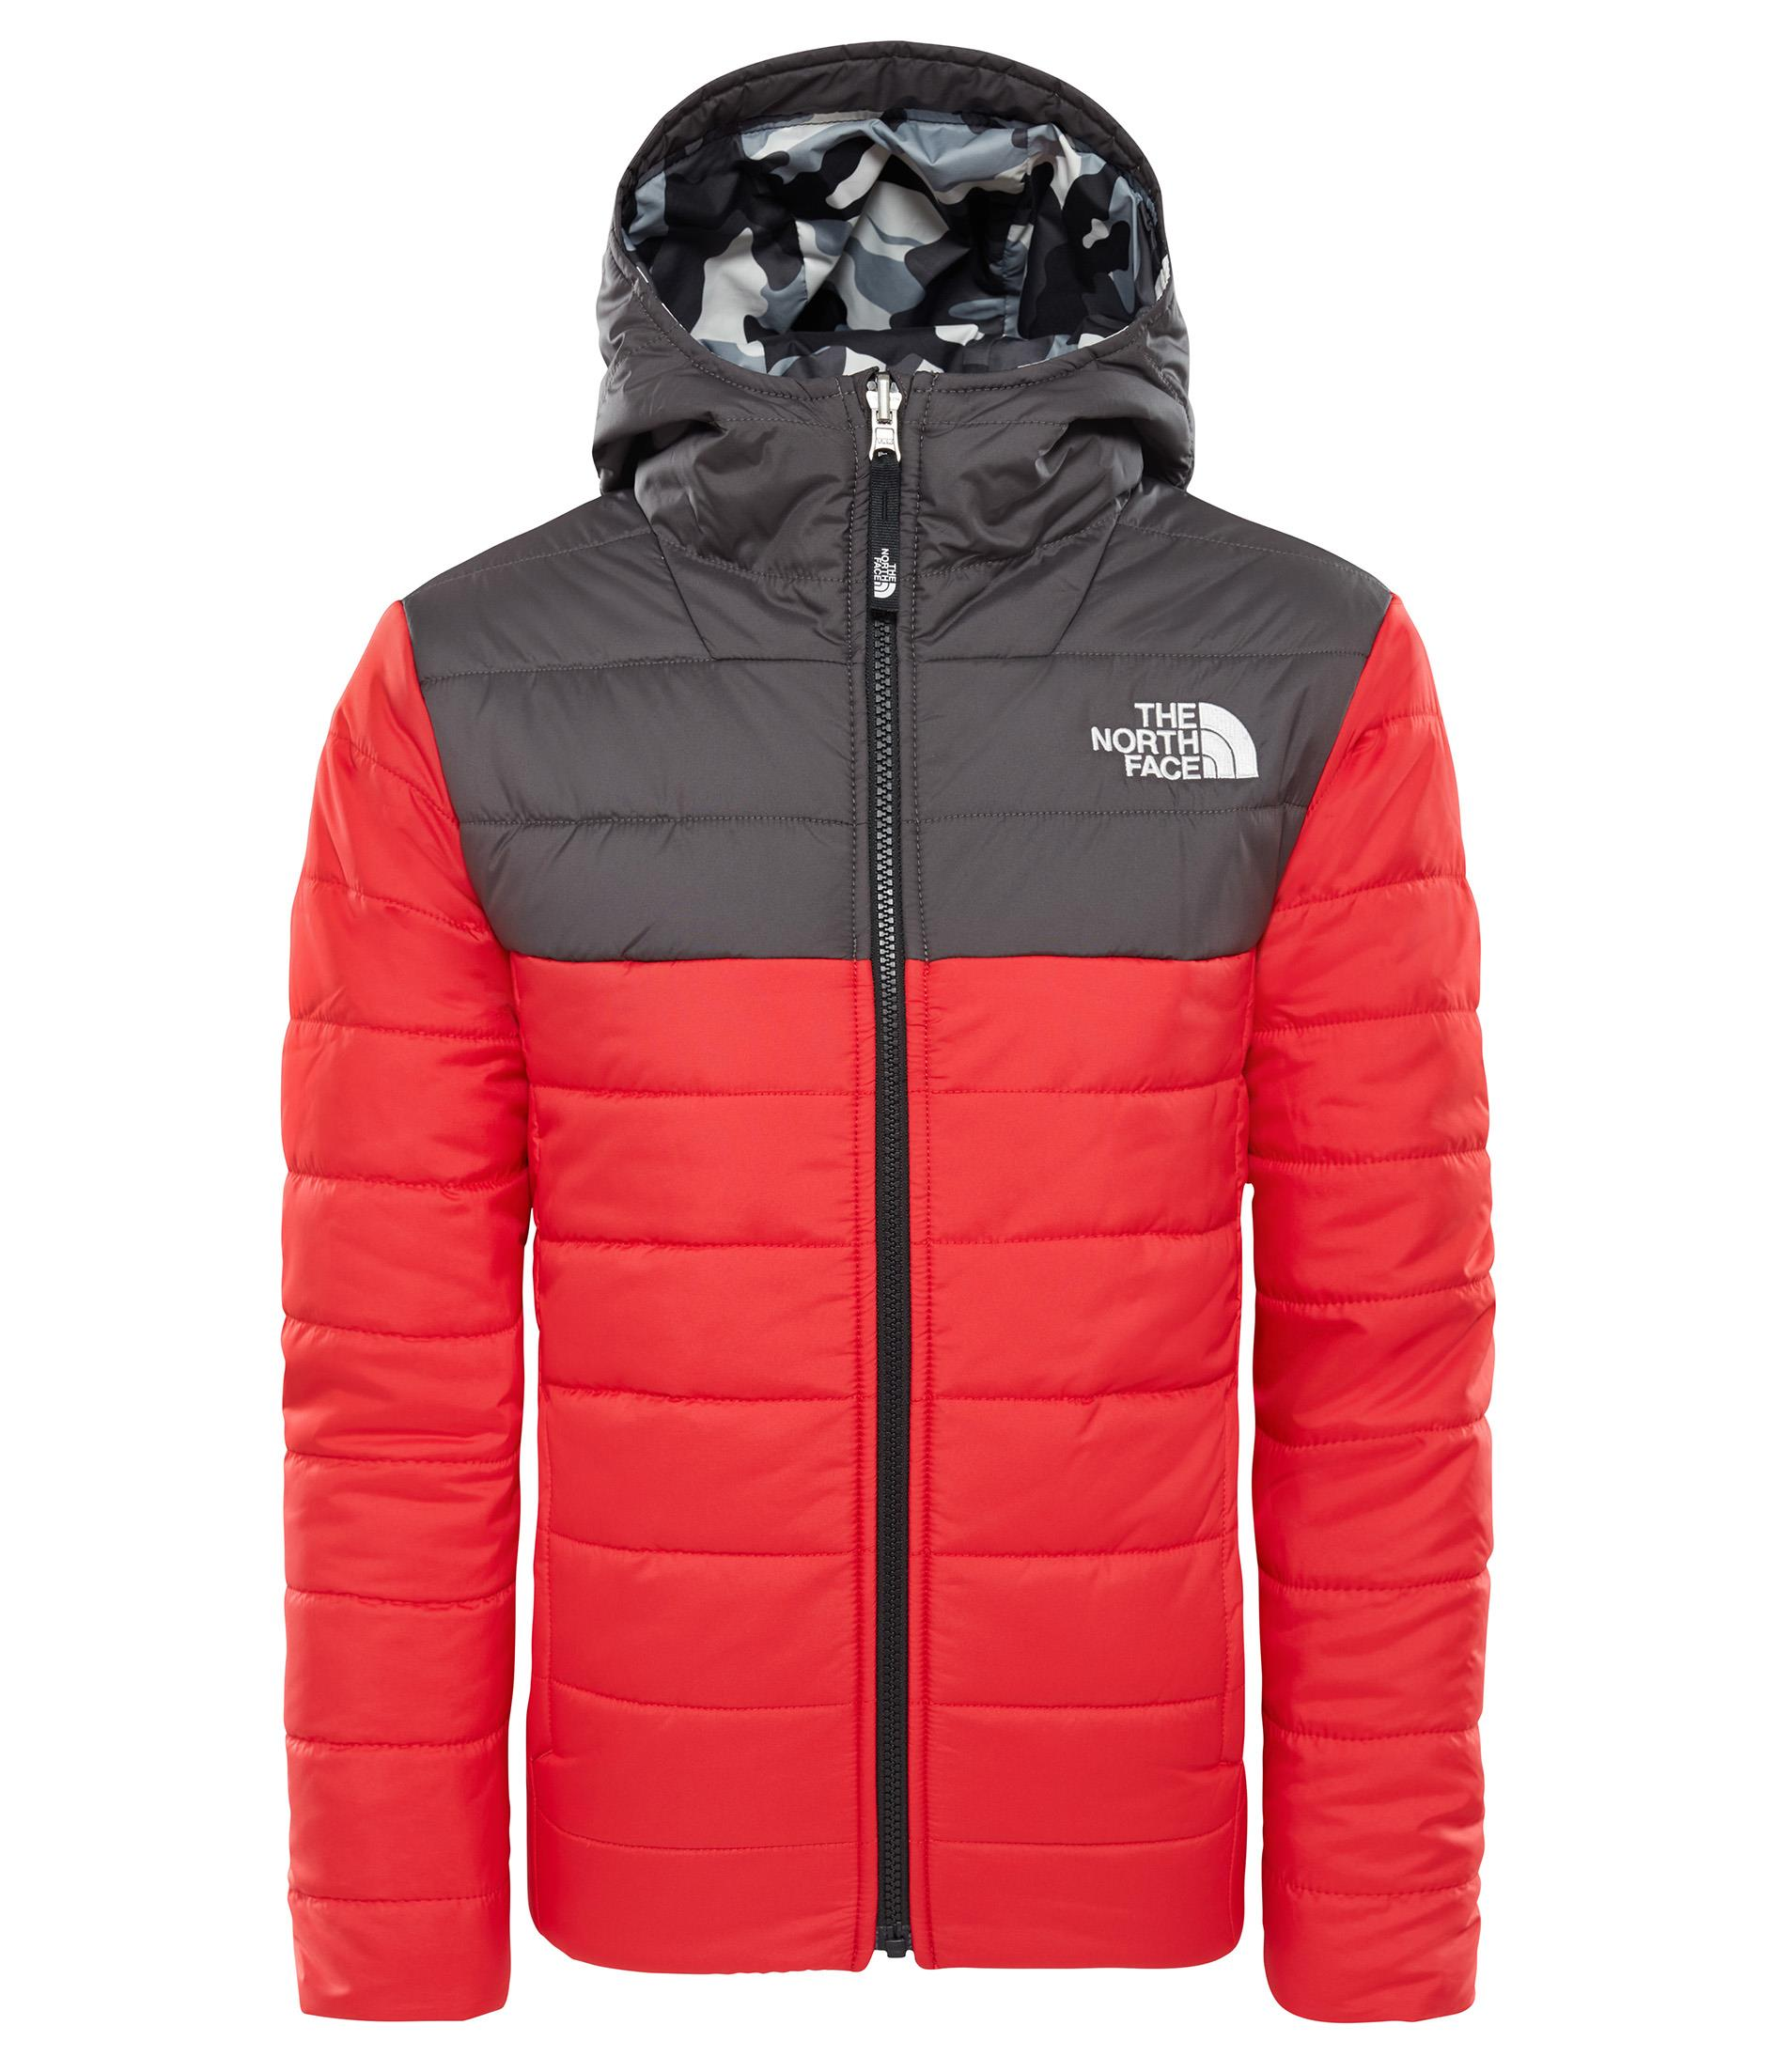 The North Face Çift Taraflı Giyilen Perrito Çocuk Ceket T93CQ2682